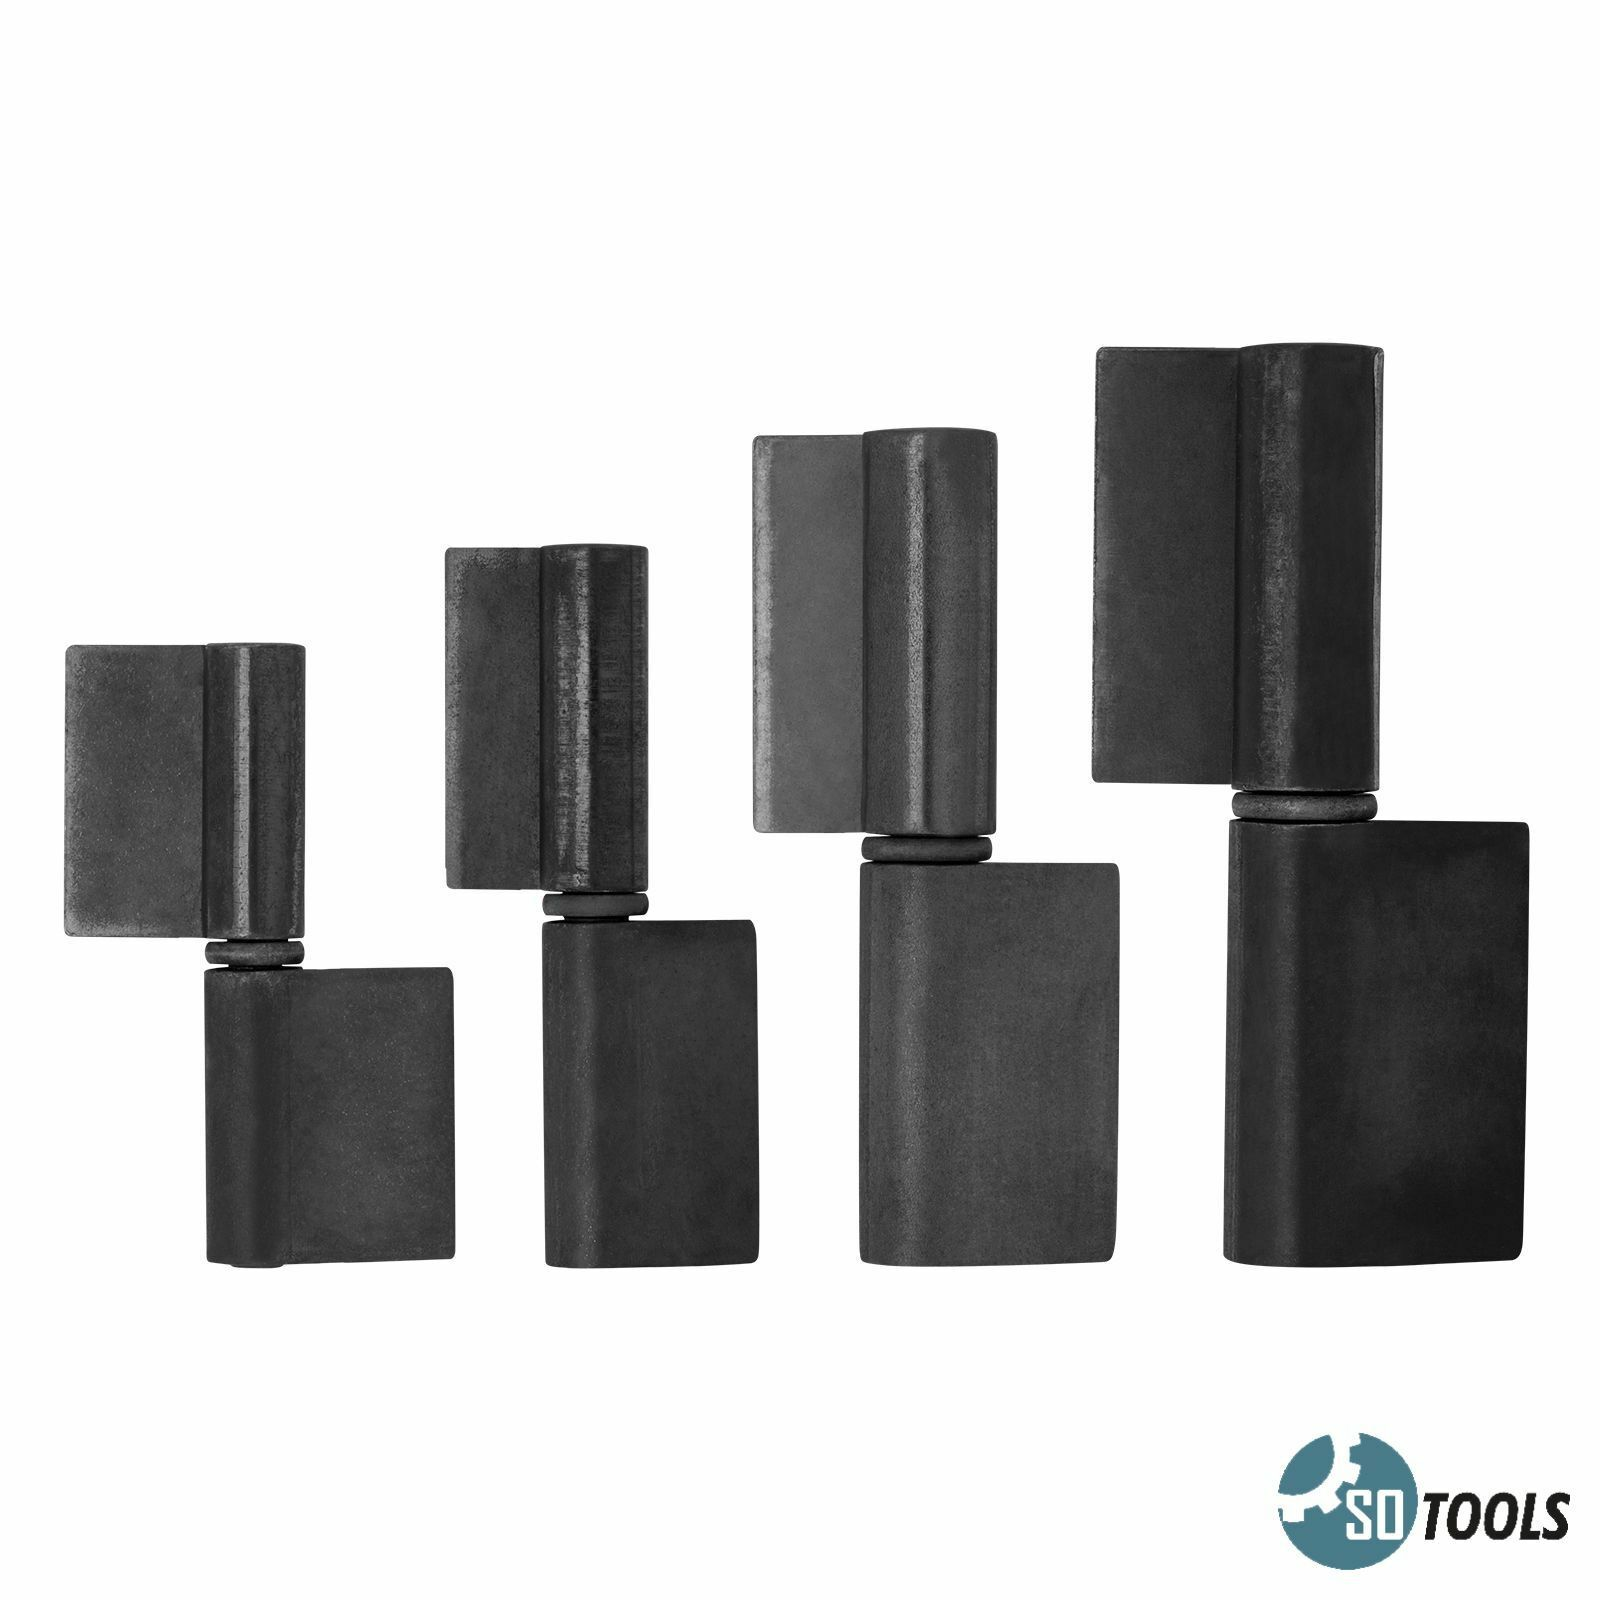 SO-TOOLS/® Anschweissband mit kurzer Fahne 15 x 120 mm Stahlscharnier Torscharnier